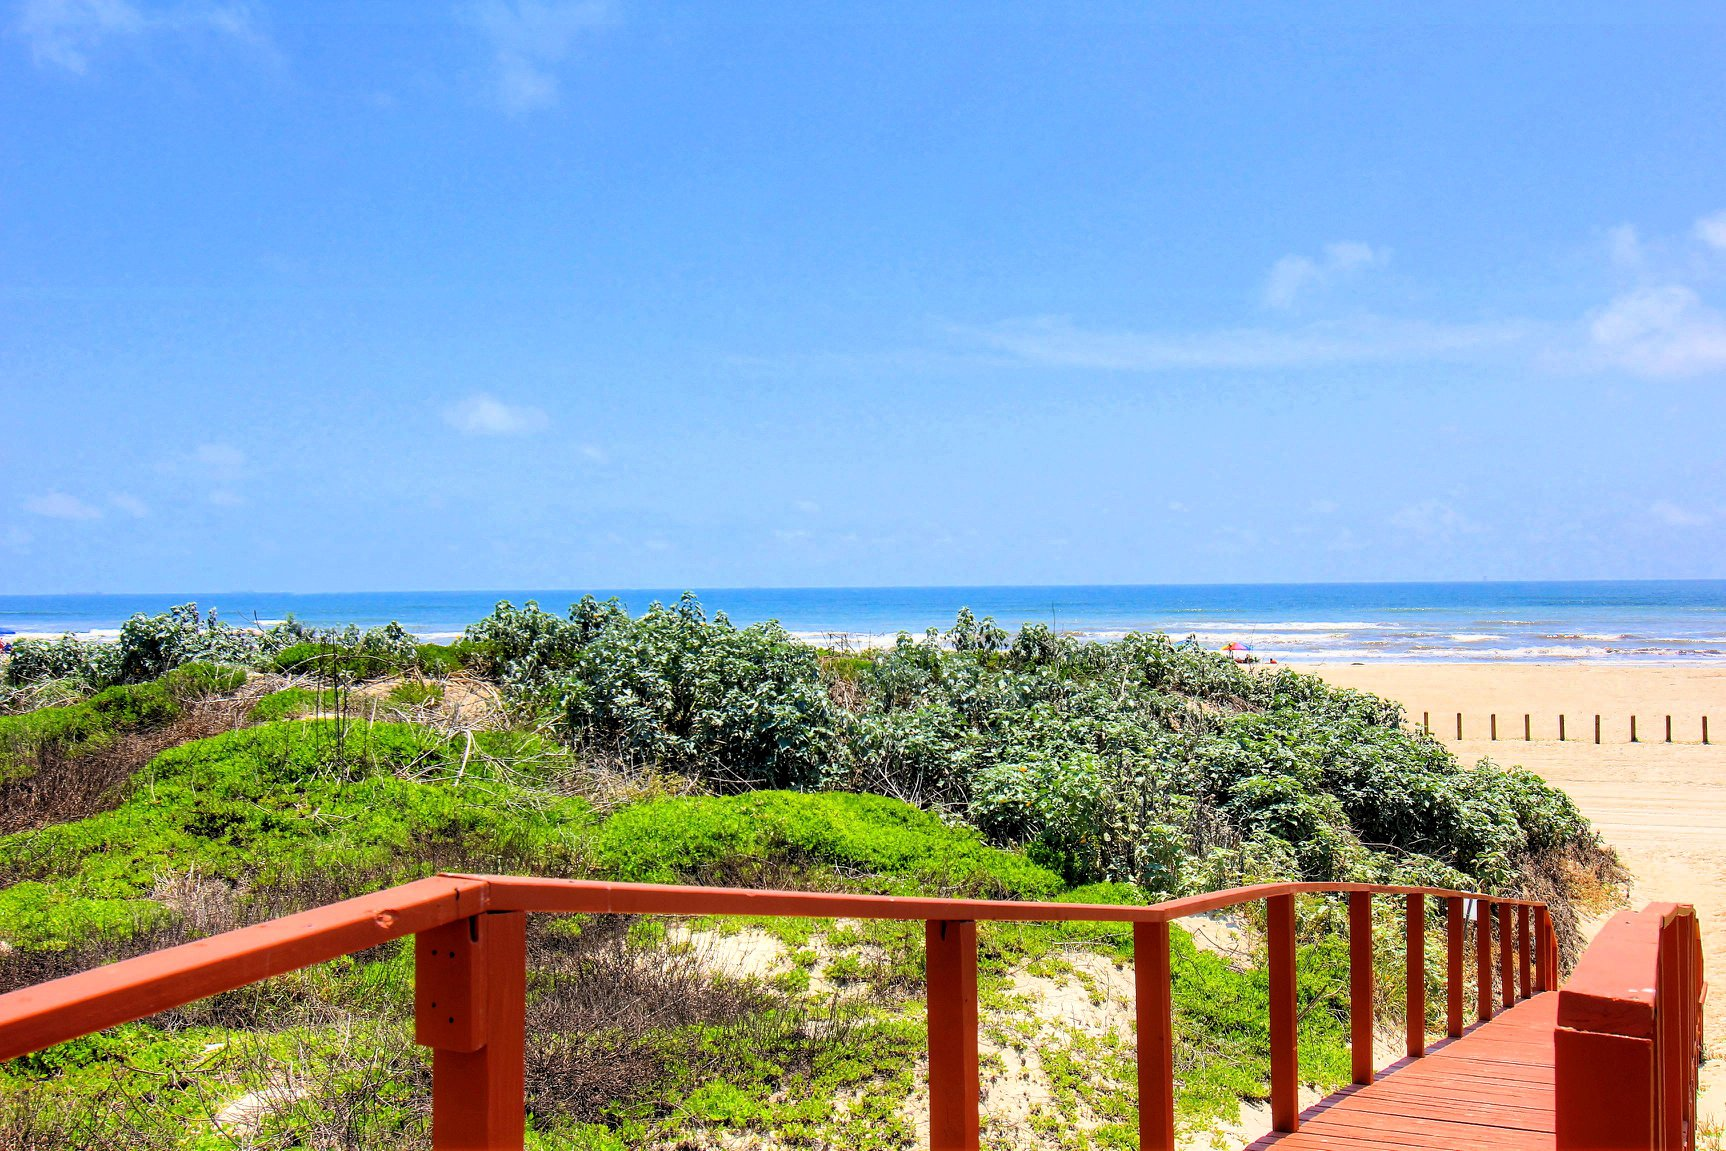 Port A Beach House Company Port Aransas Mustang Island Beach Texas Gulf Coast